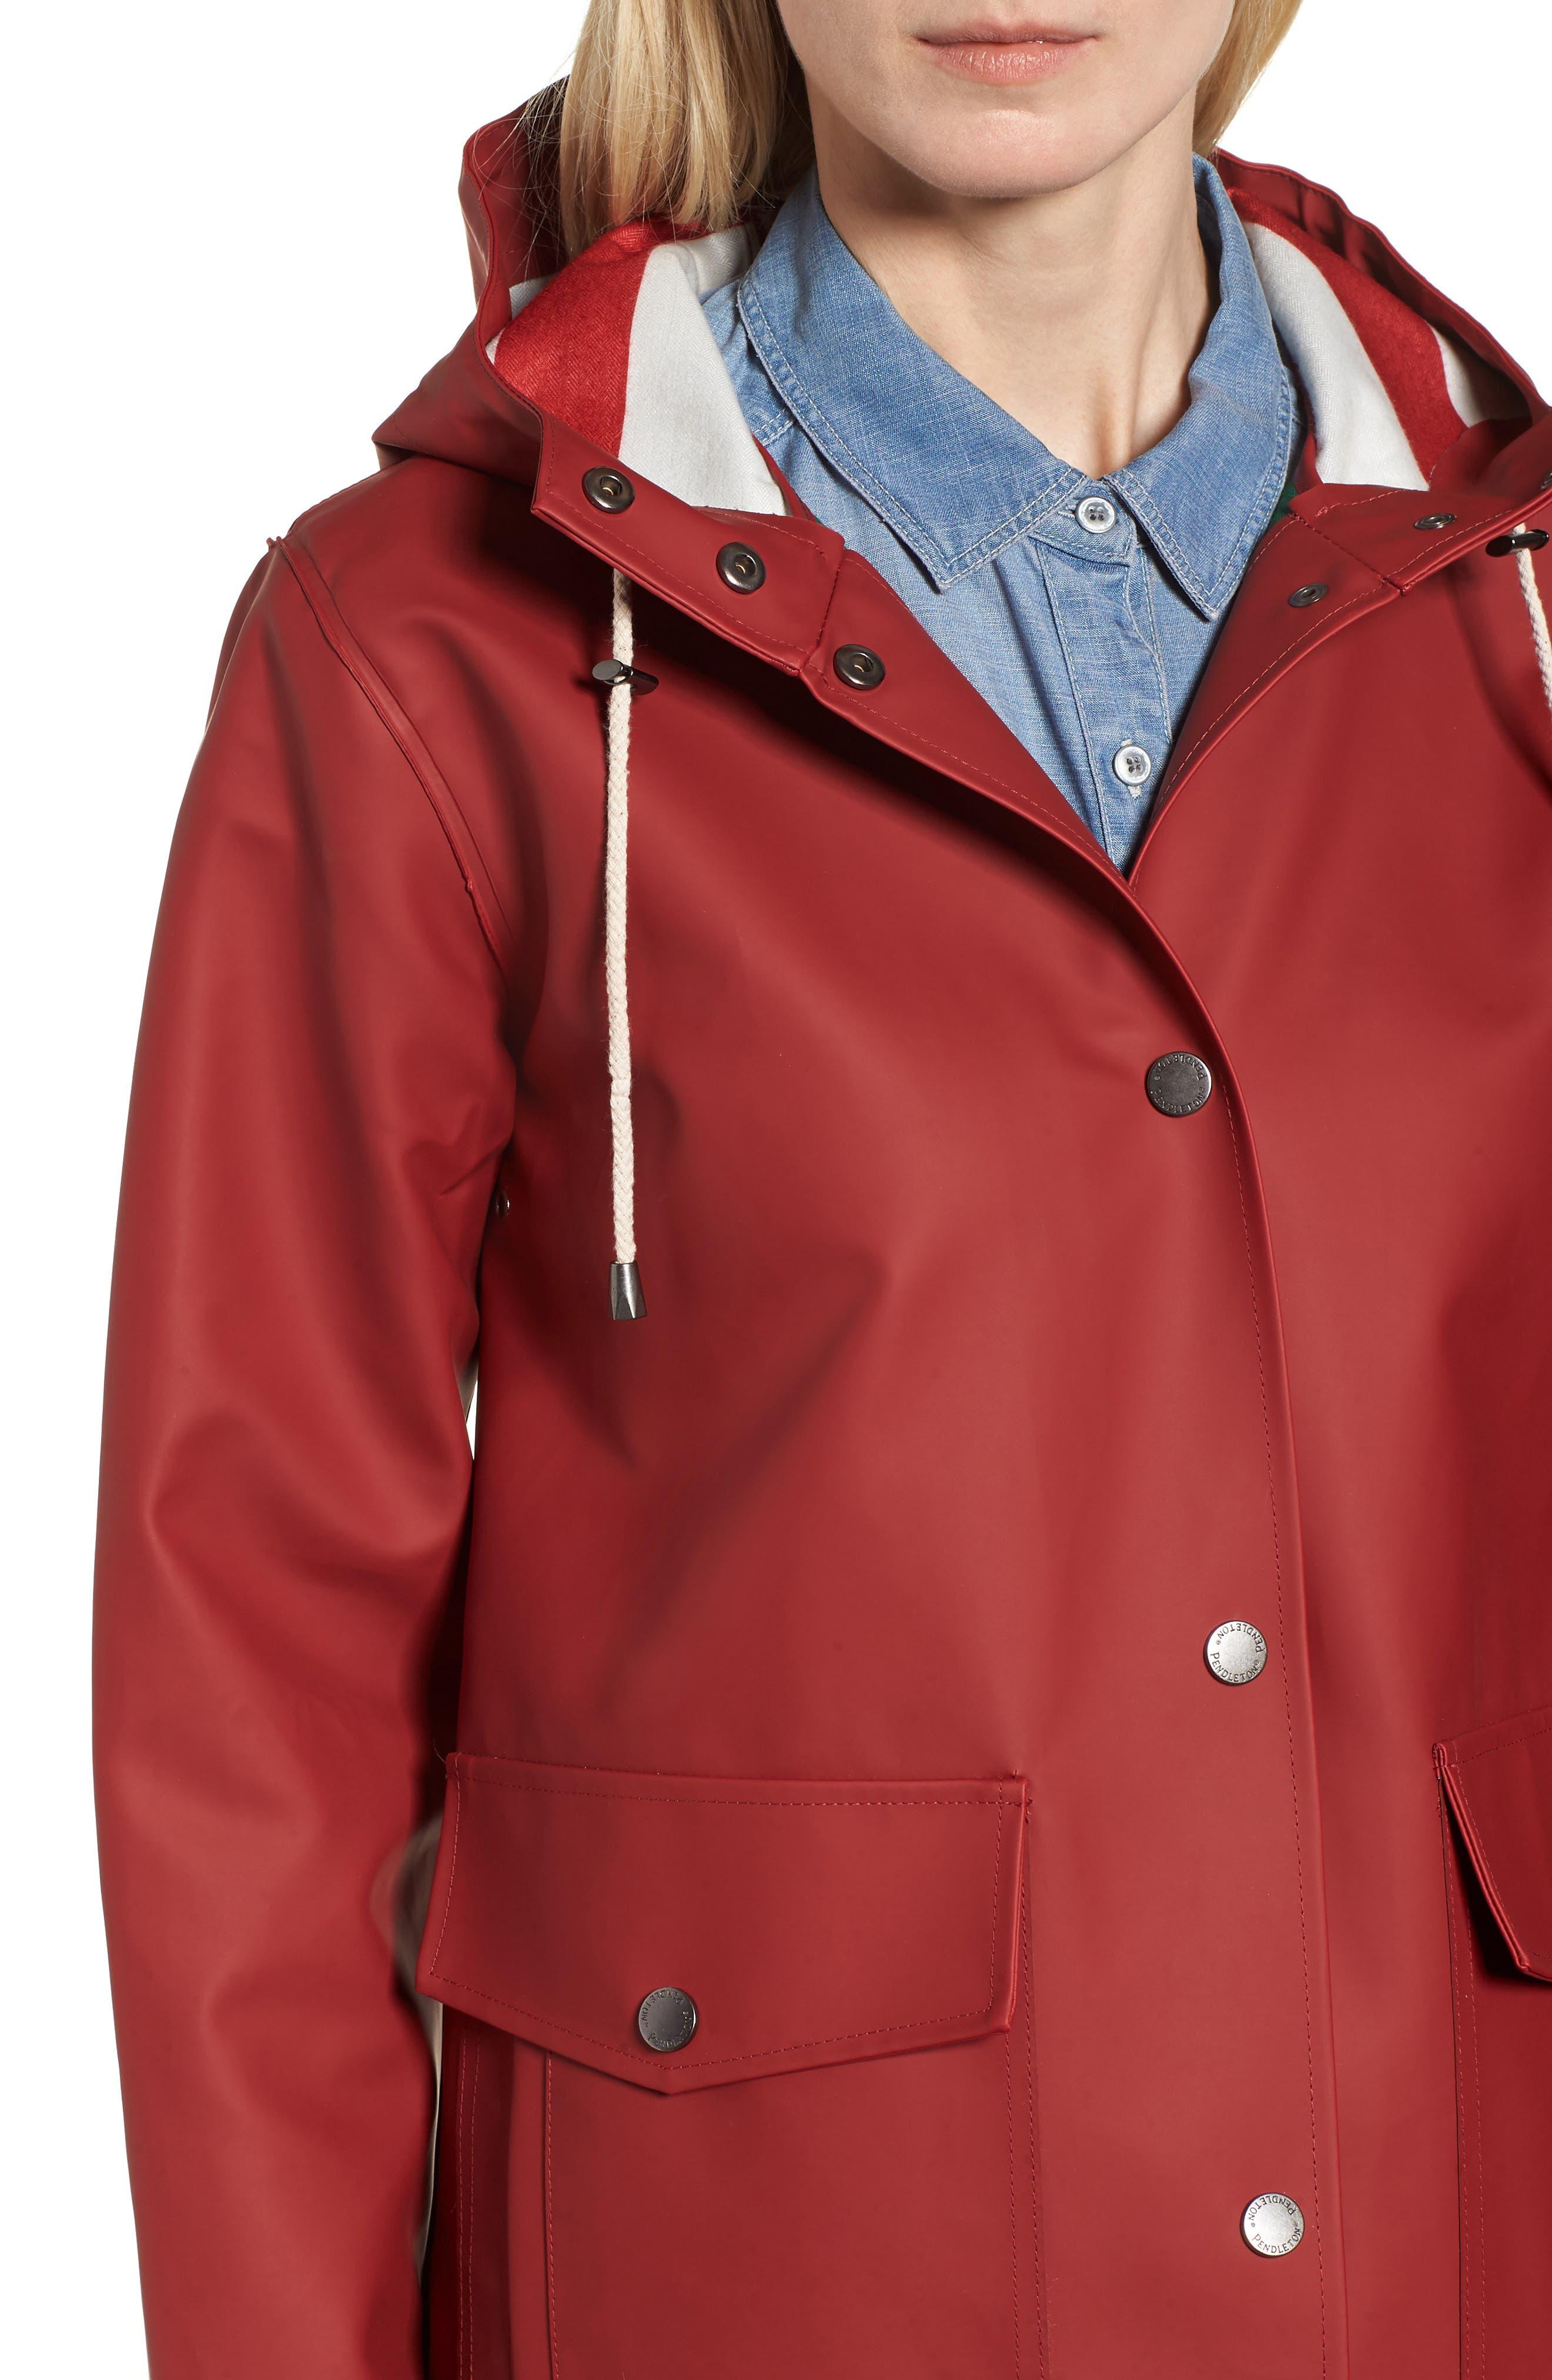 Surrey Hooded Rain Slicker,                             Alternate thumbnail 4, color,                             Red